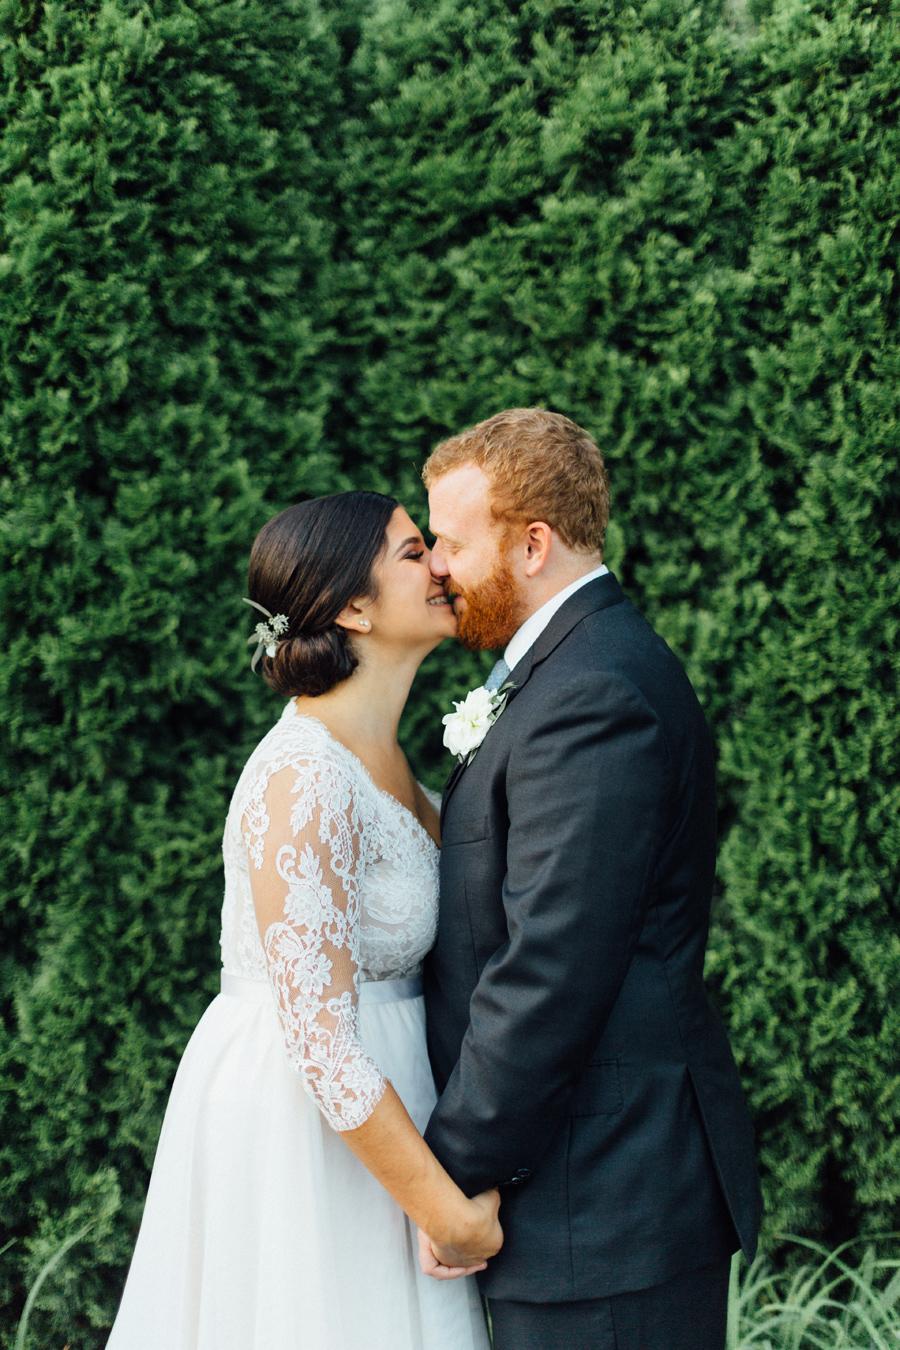 the-inn-at-leola-wedding-lancaster-pennsylvania-wedding-photographer-rebeka-viola-photograhy (99).jpg